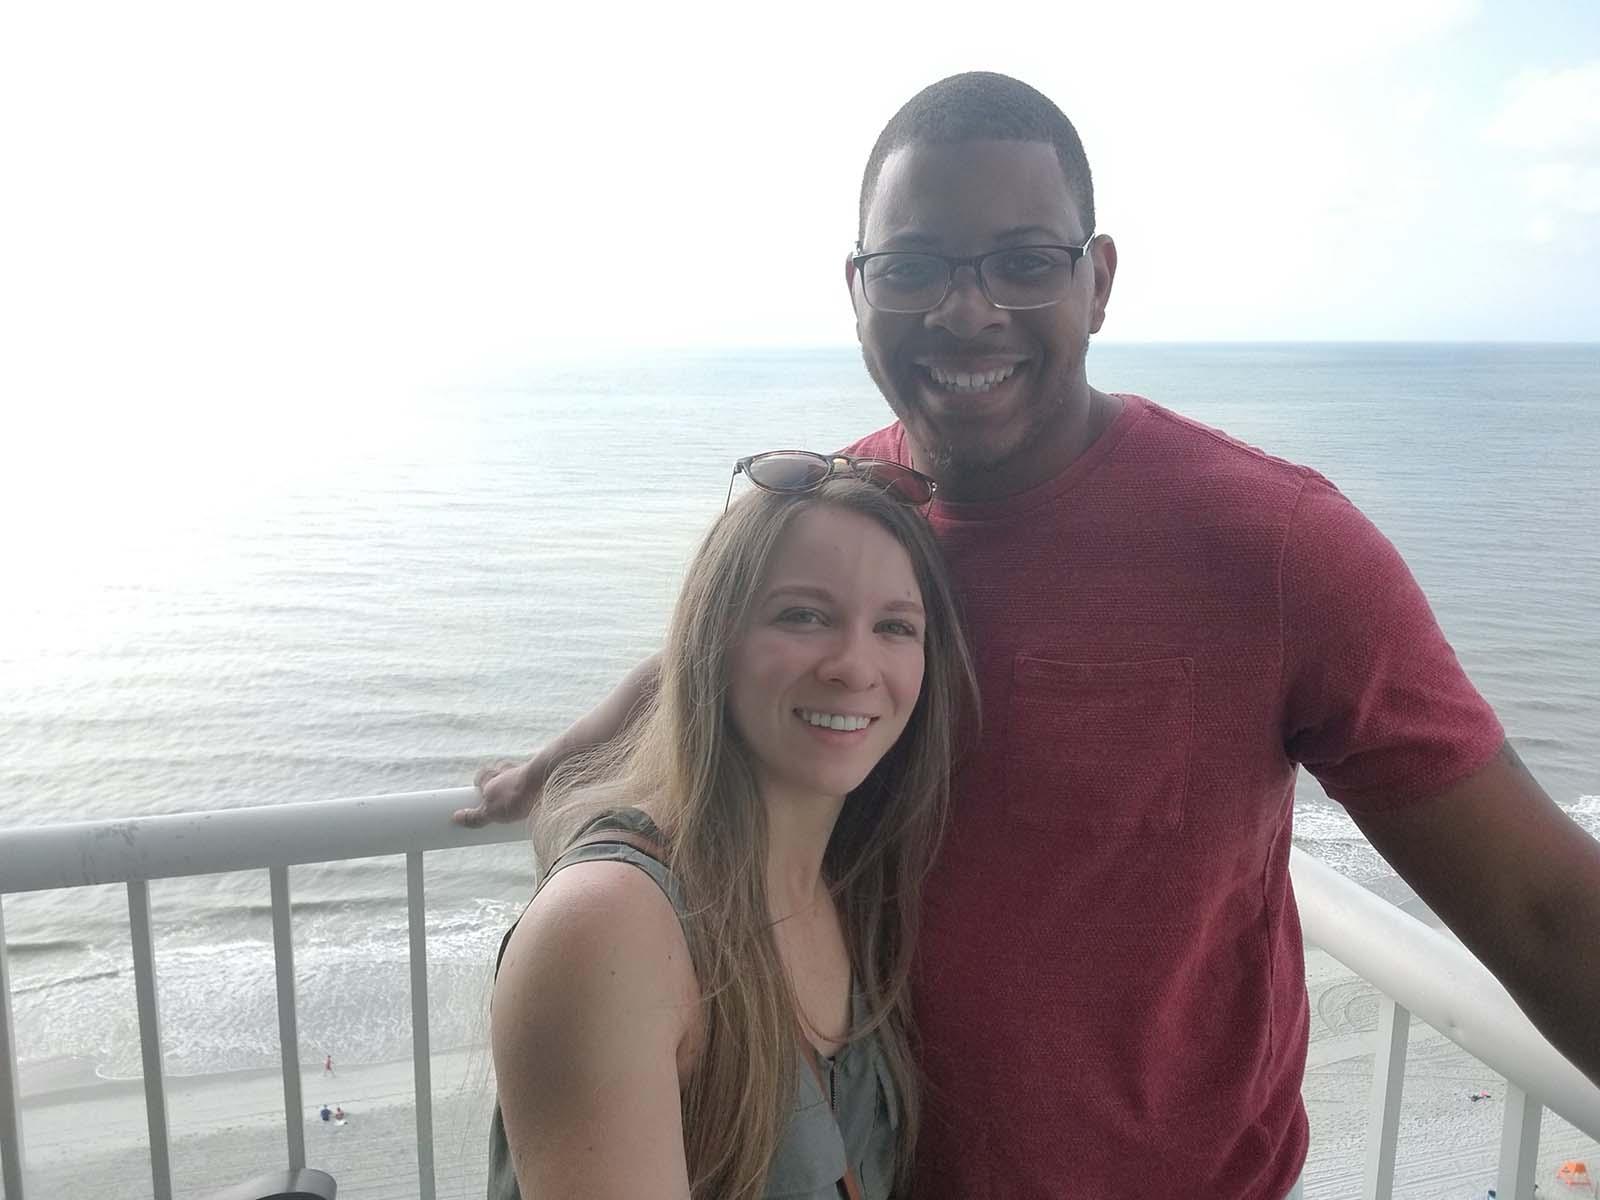 Couple taking photo together on balcony